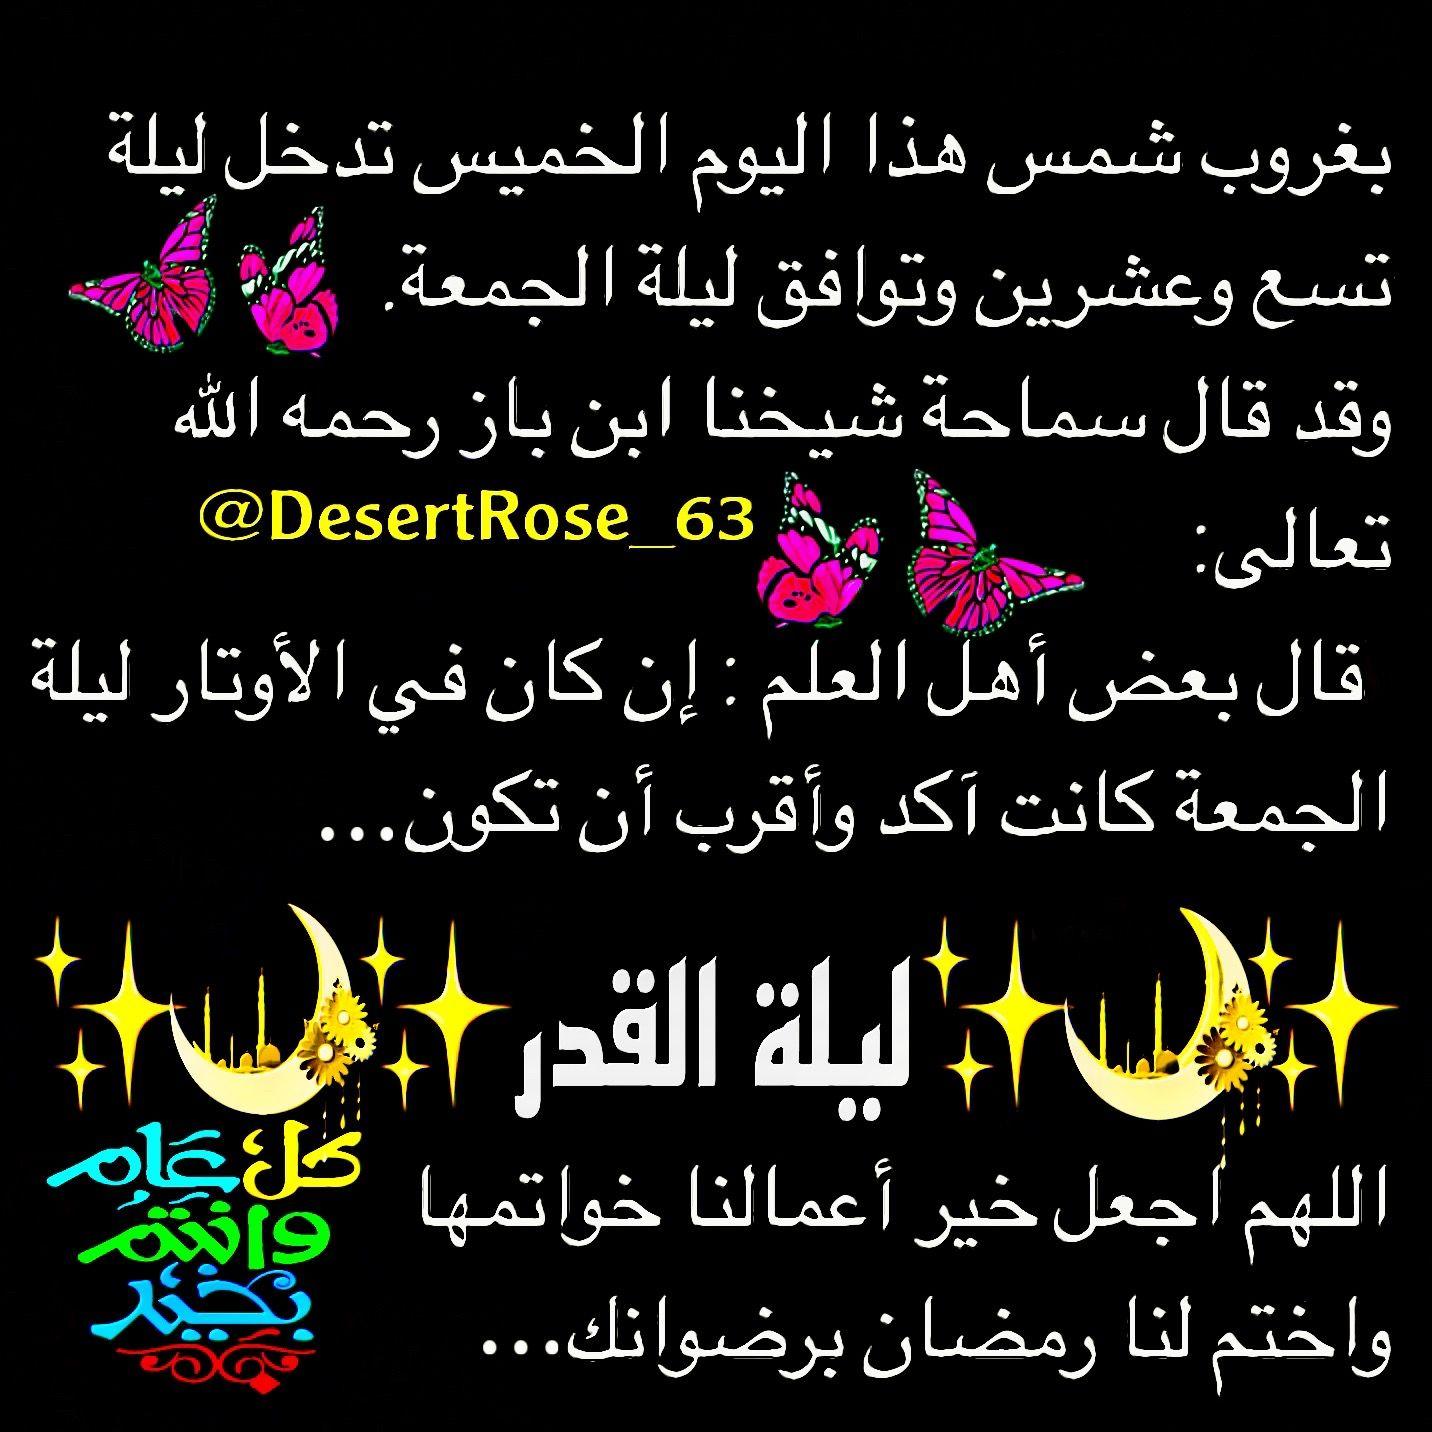 Pin By Desert Rose On كلماتي ليست كالكلمات Ramadan Kareem Ramadan Kareem